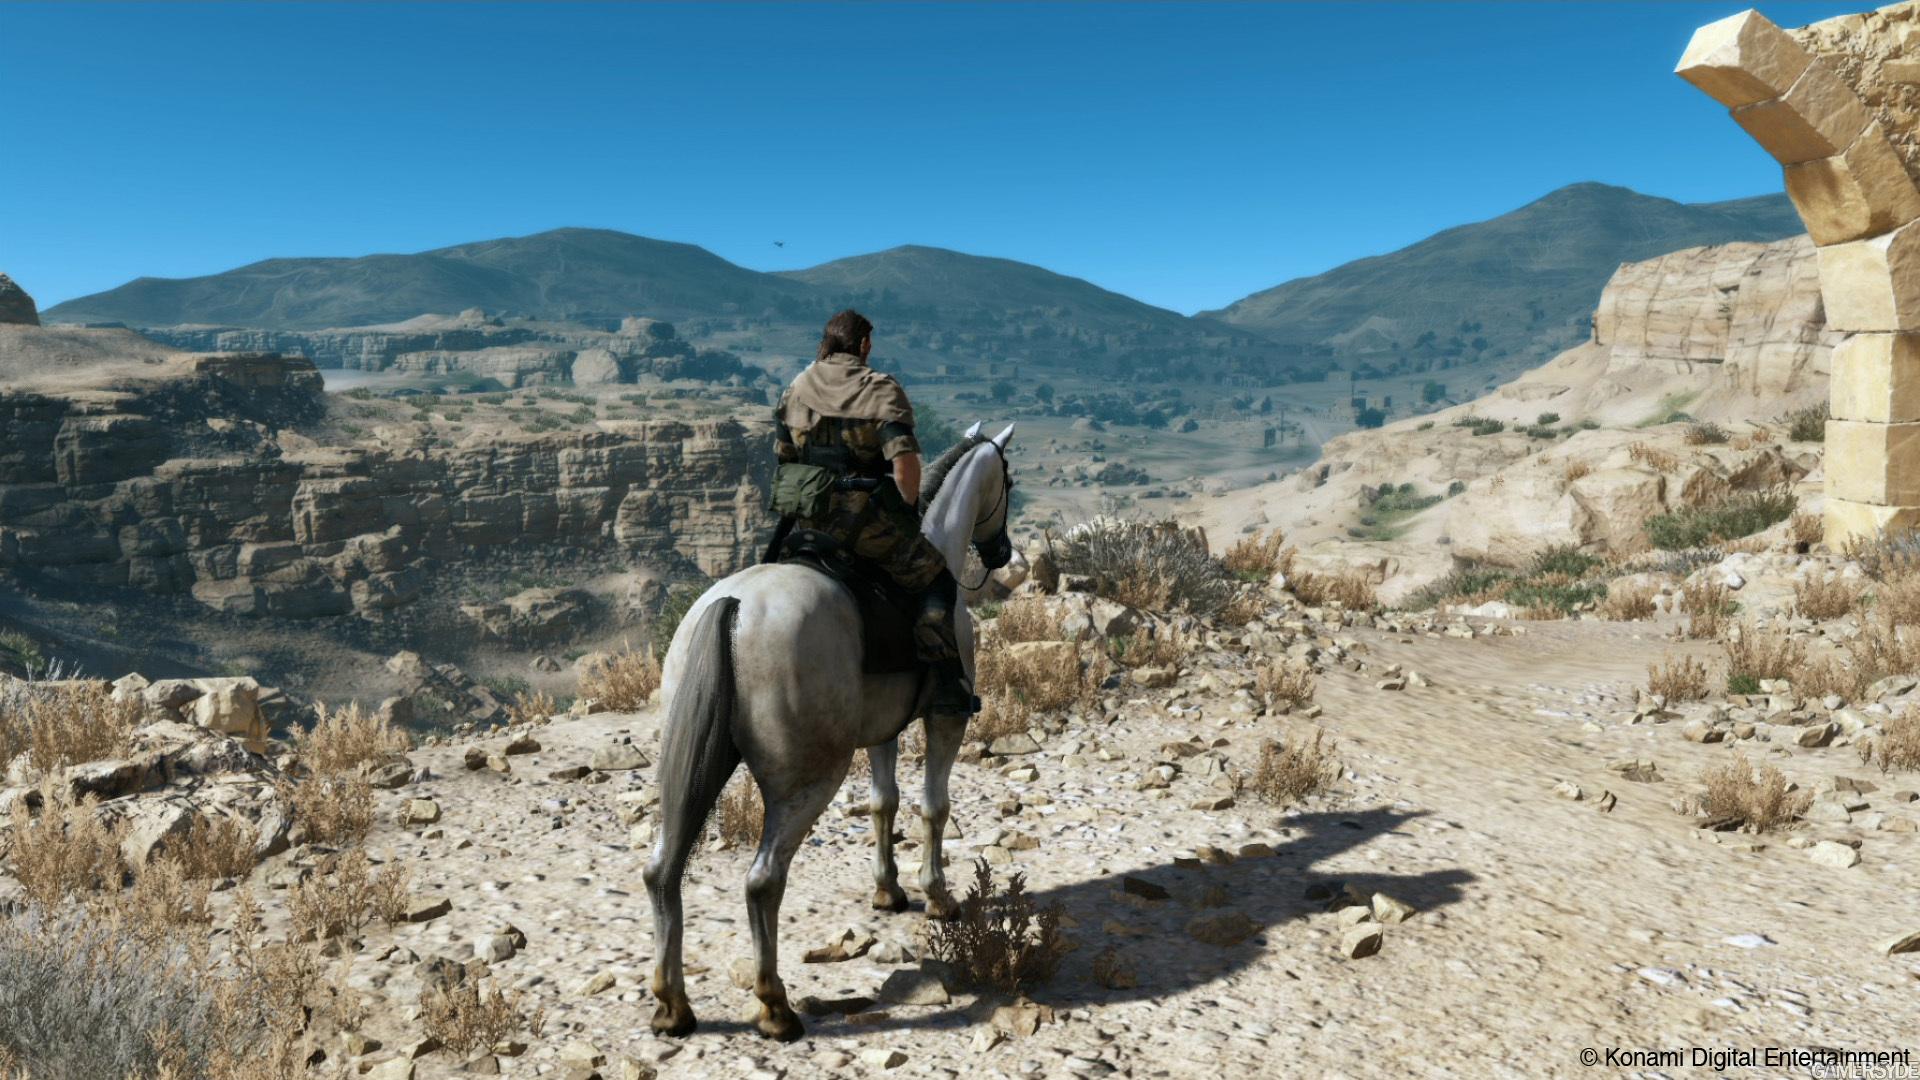 image metal gear solid v the phantom pain 22381 2584 0002 بازگشت پر سر و صدای مار بی صدا ! | تحلیل و بررسی نمایش Metal Gear Solid V : The Phantom Pain در نمایشگاه E3 2013